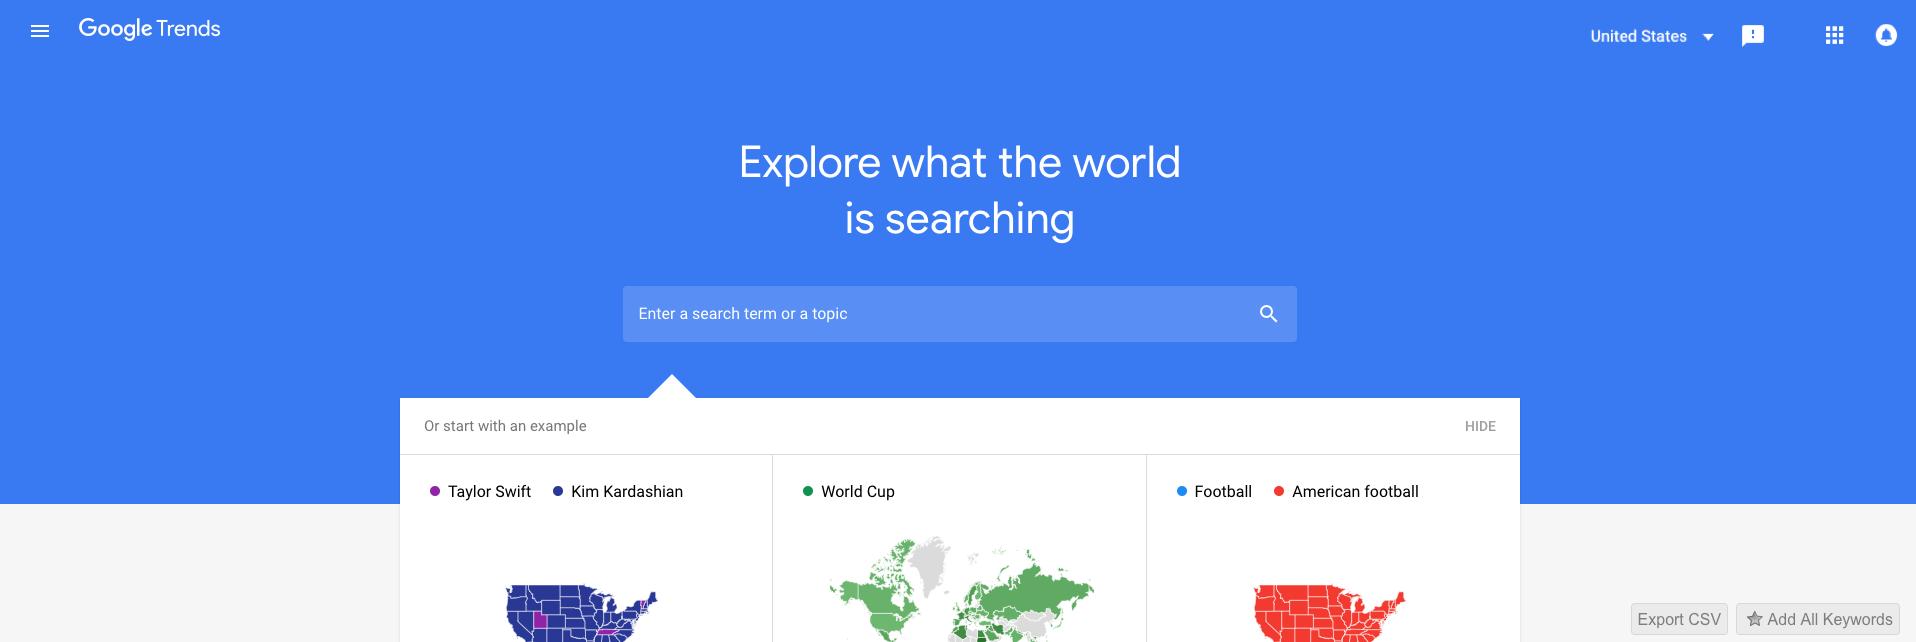 Google Trends - SEO